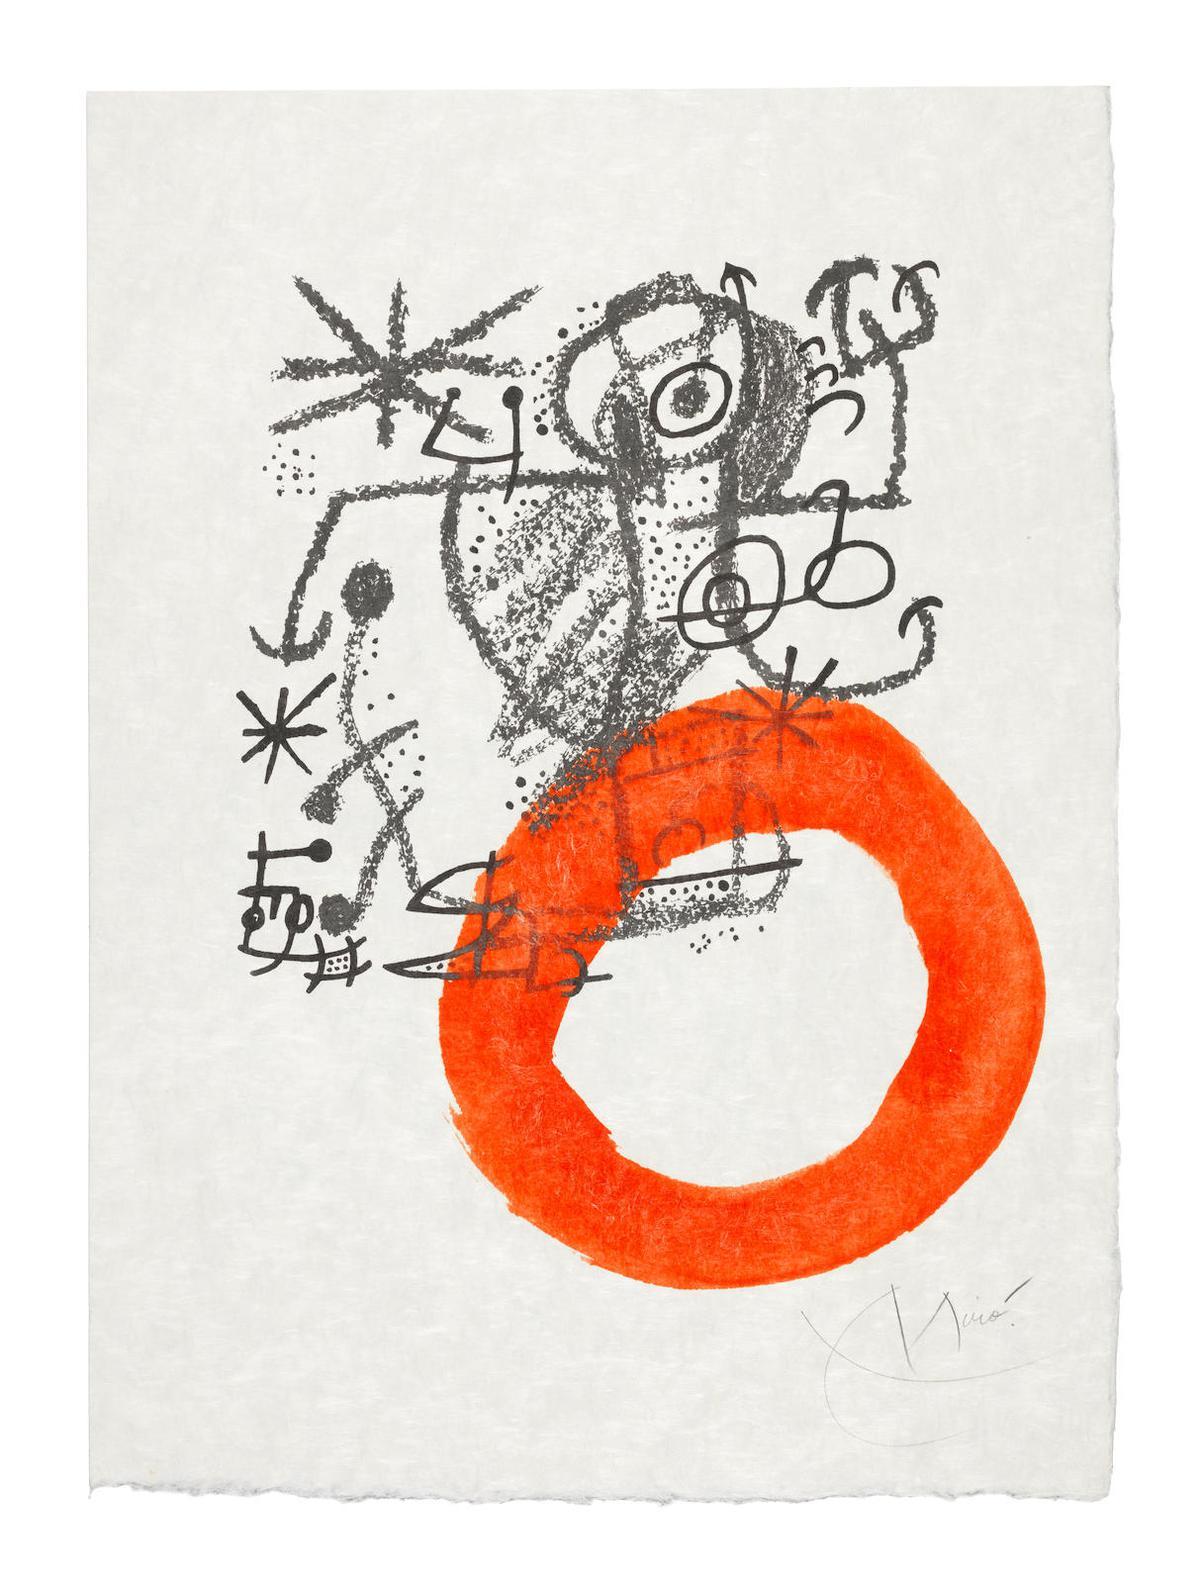 Joan Miro-One Plate, From Les Essencies De La Terra(Mourlot 577; Cramer Books 123)-1968